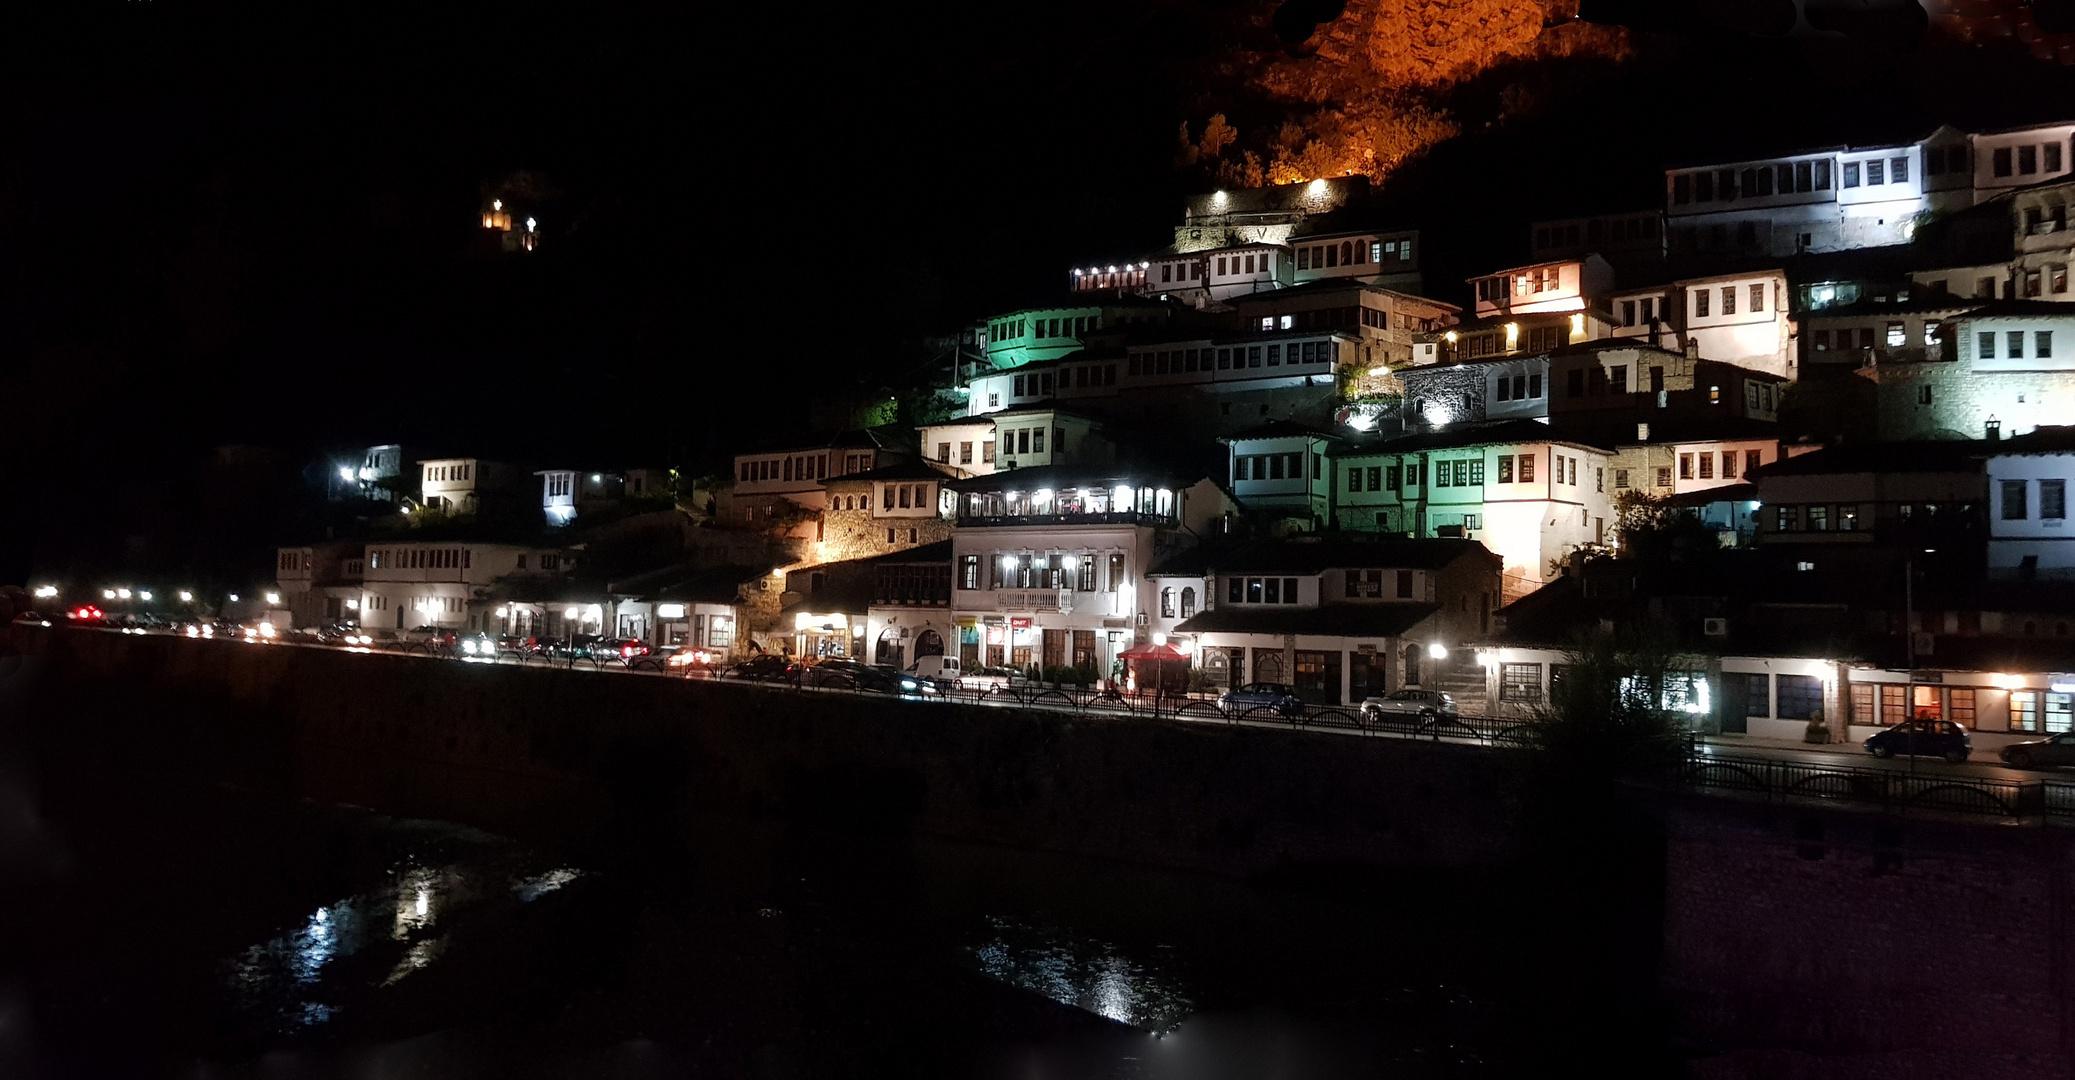 Albanien Abends in Berat am Burgberg